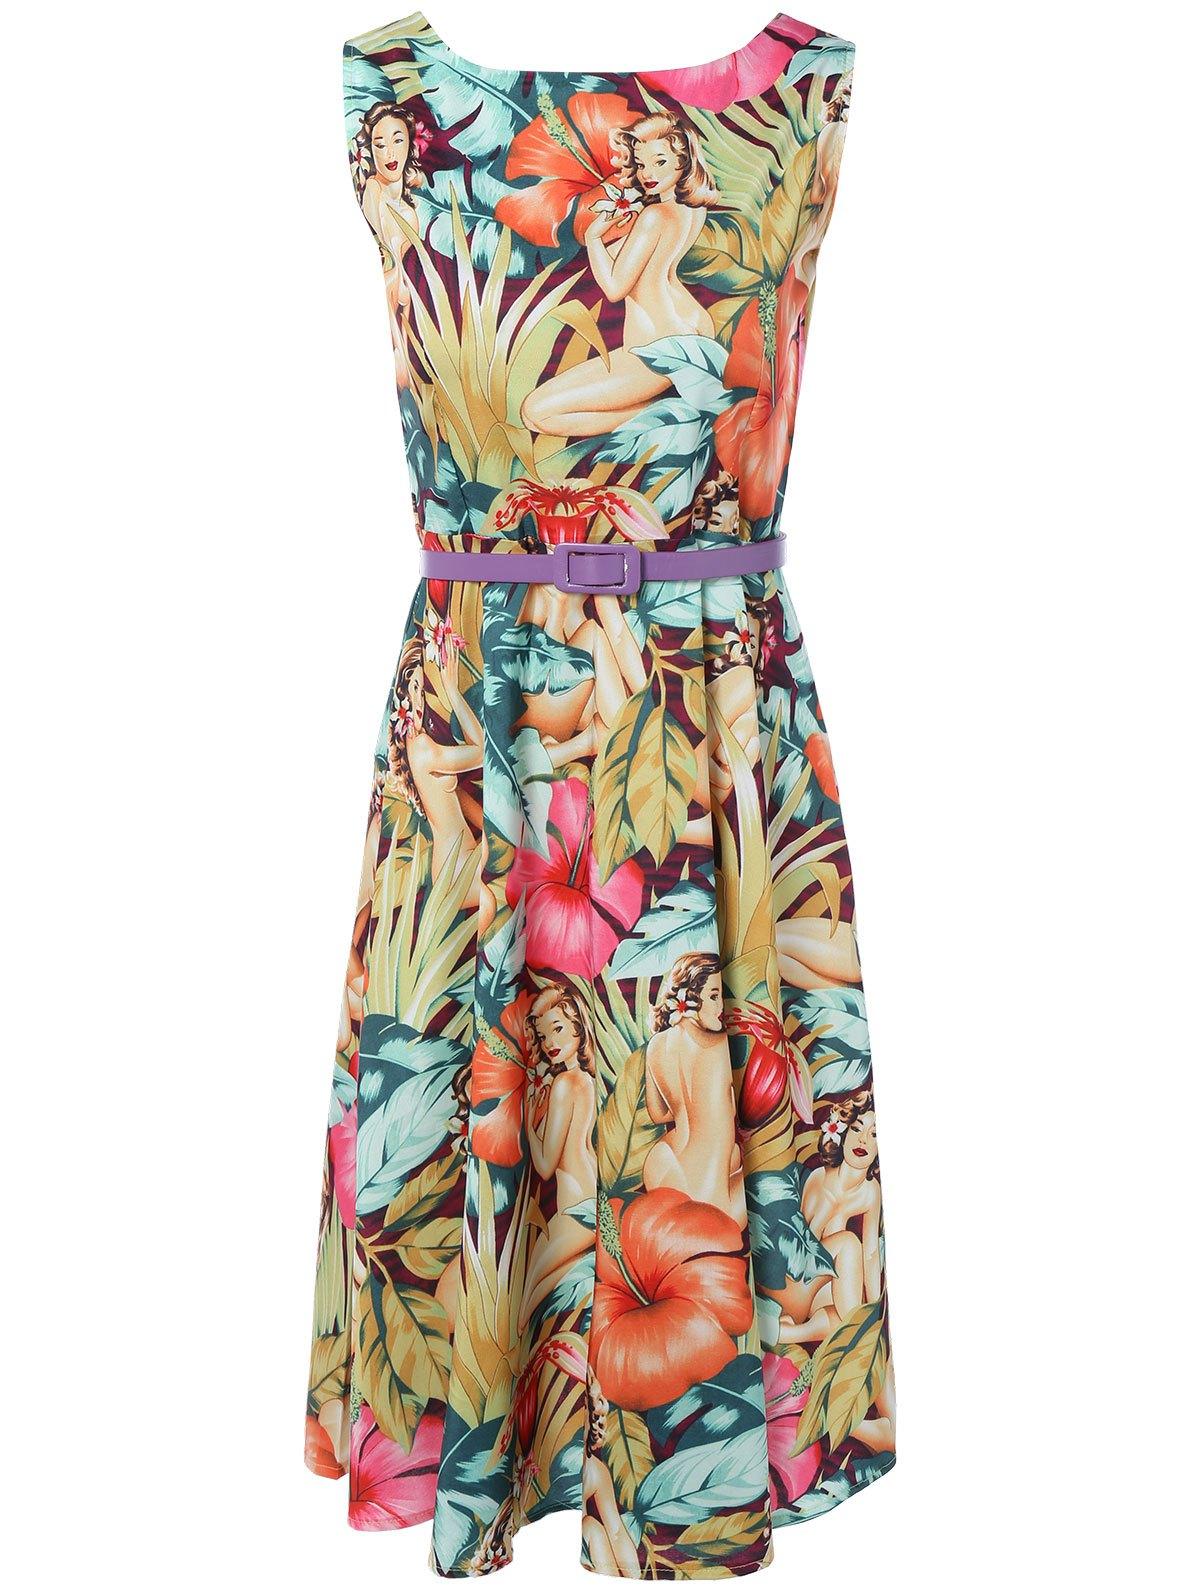 Vintage Round Neck Printed Dress